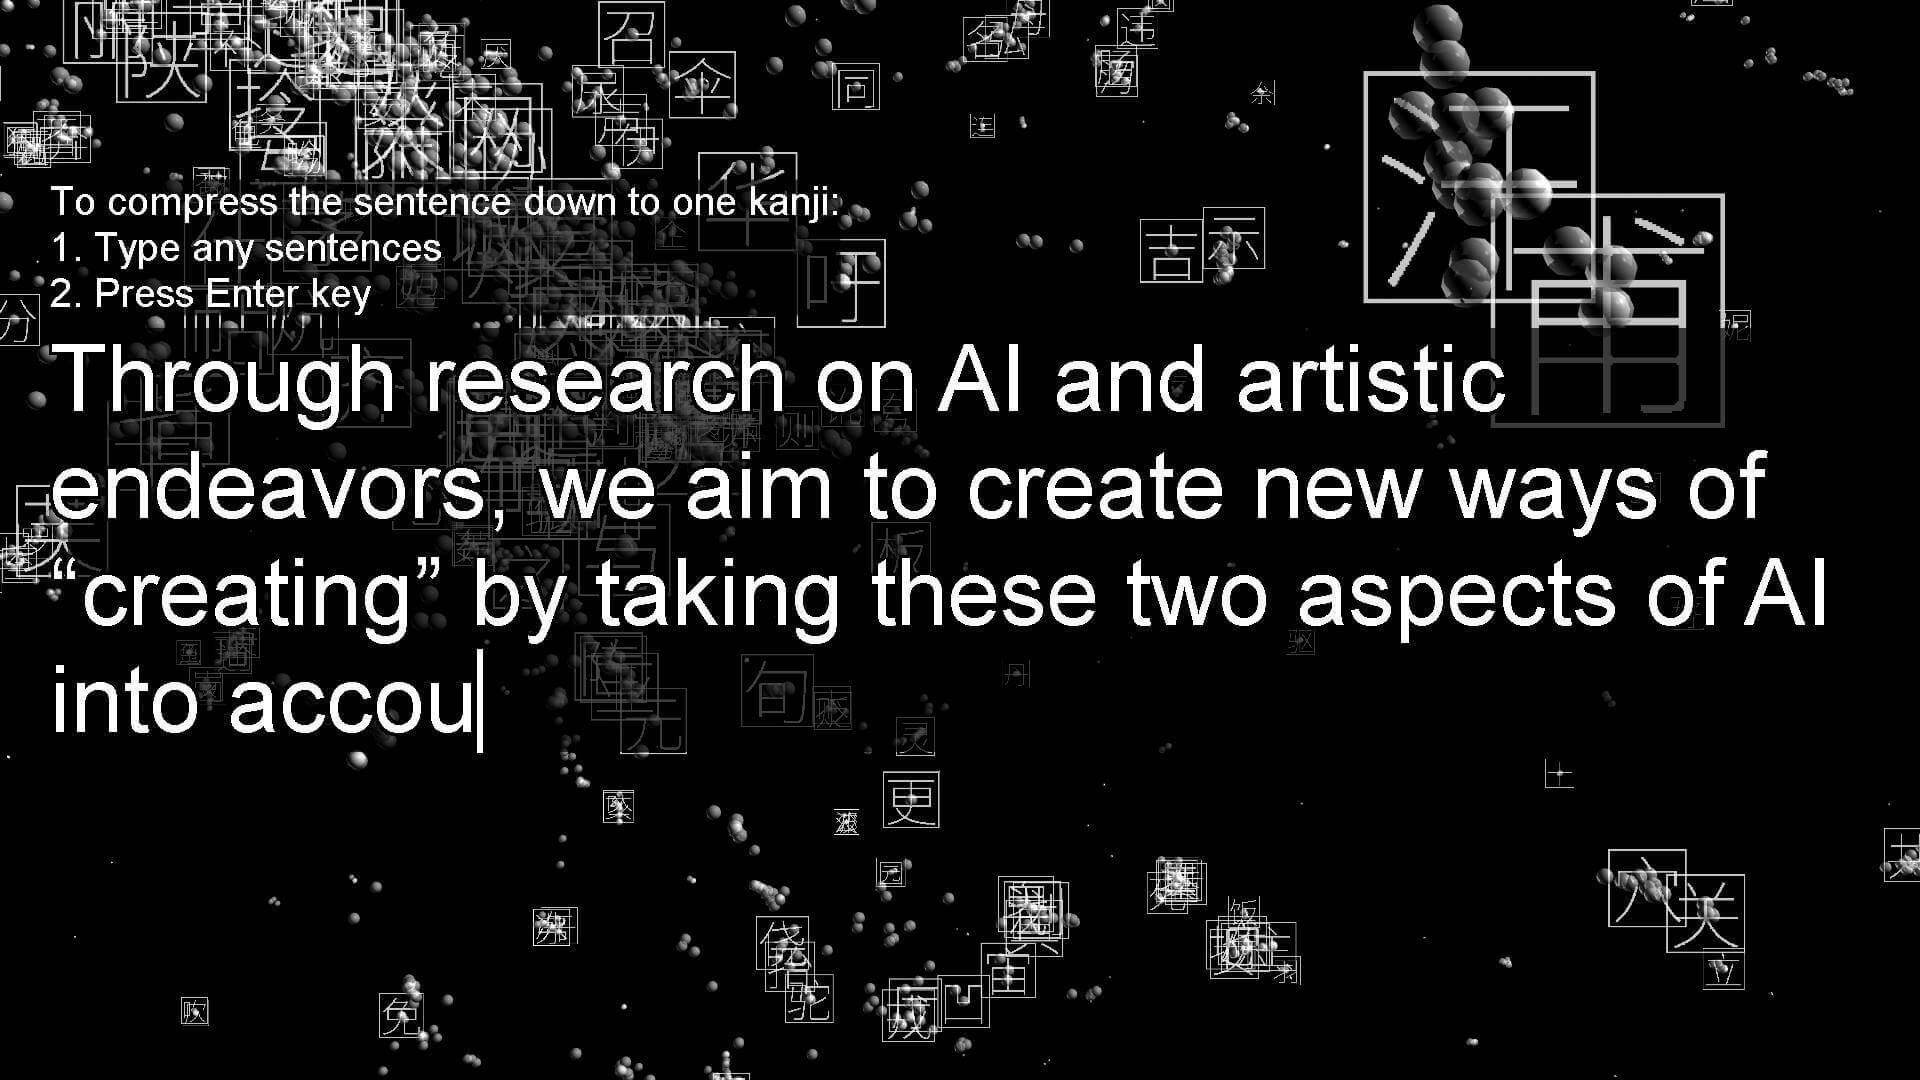 AIとコロナ禍が社会に与える影響とは?慶応大研究生による<CCLab Exhibition 2021 Alternative Dimension>が開催 art210917_cclab_exhibition_09